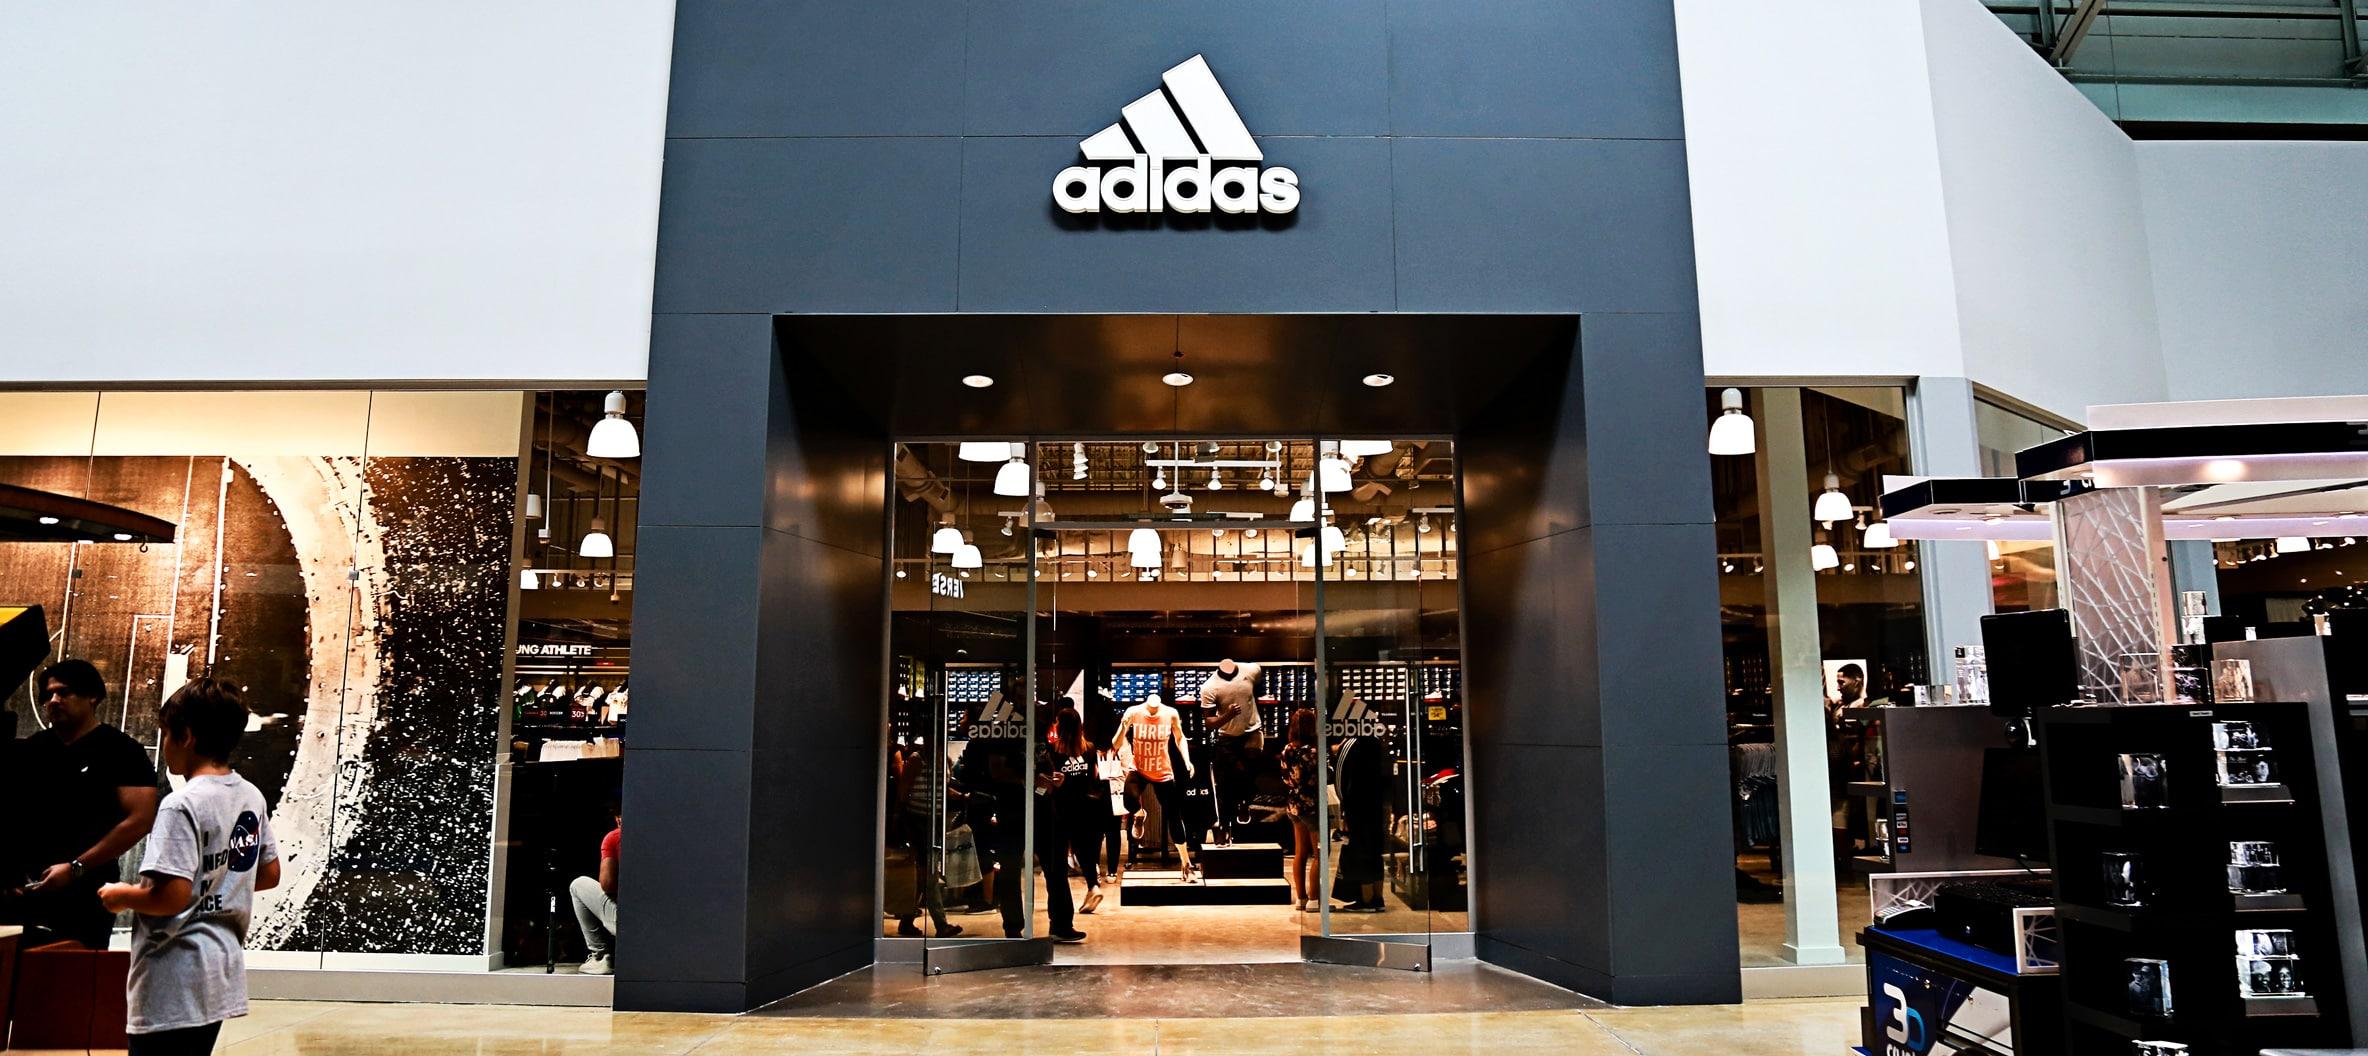 verbo salario buscar  Adidas Factory Outlet Store | Miami | Dolphin Mall